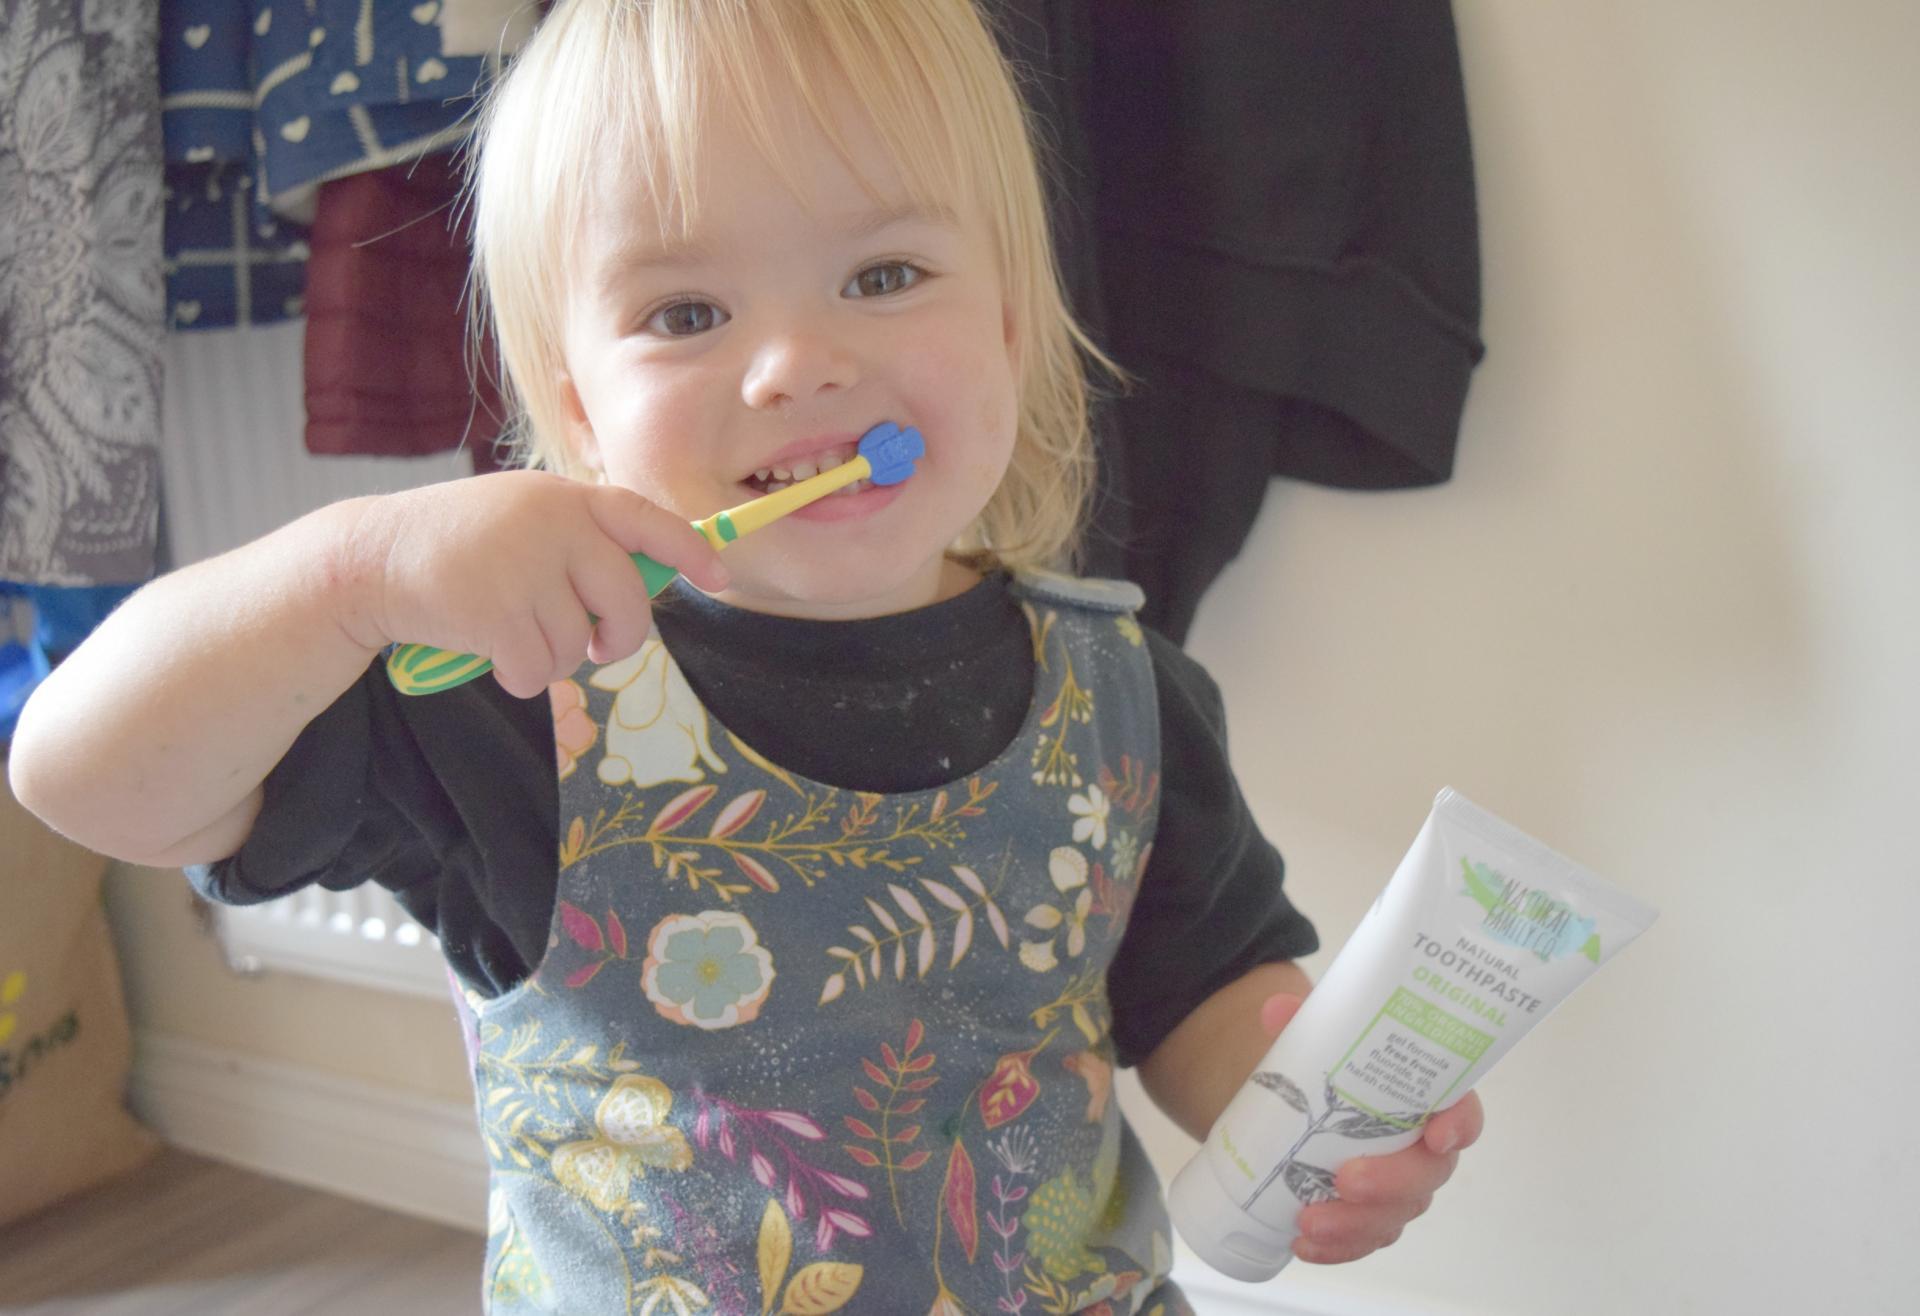 Jack & Jill toothpaste